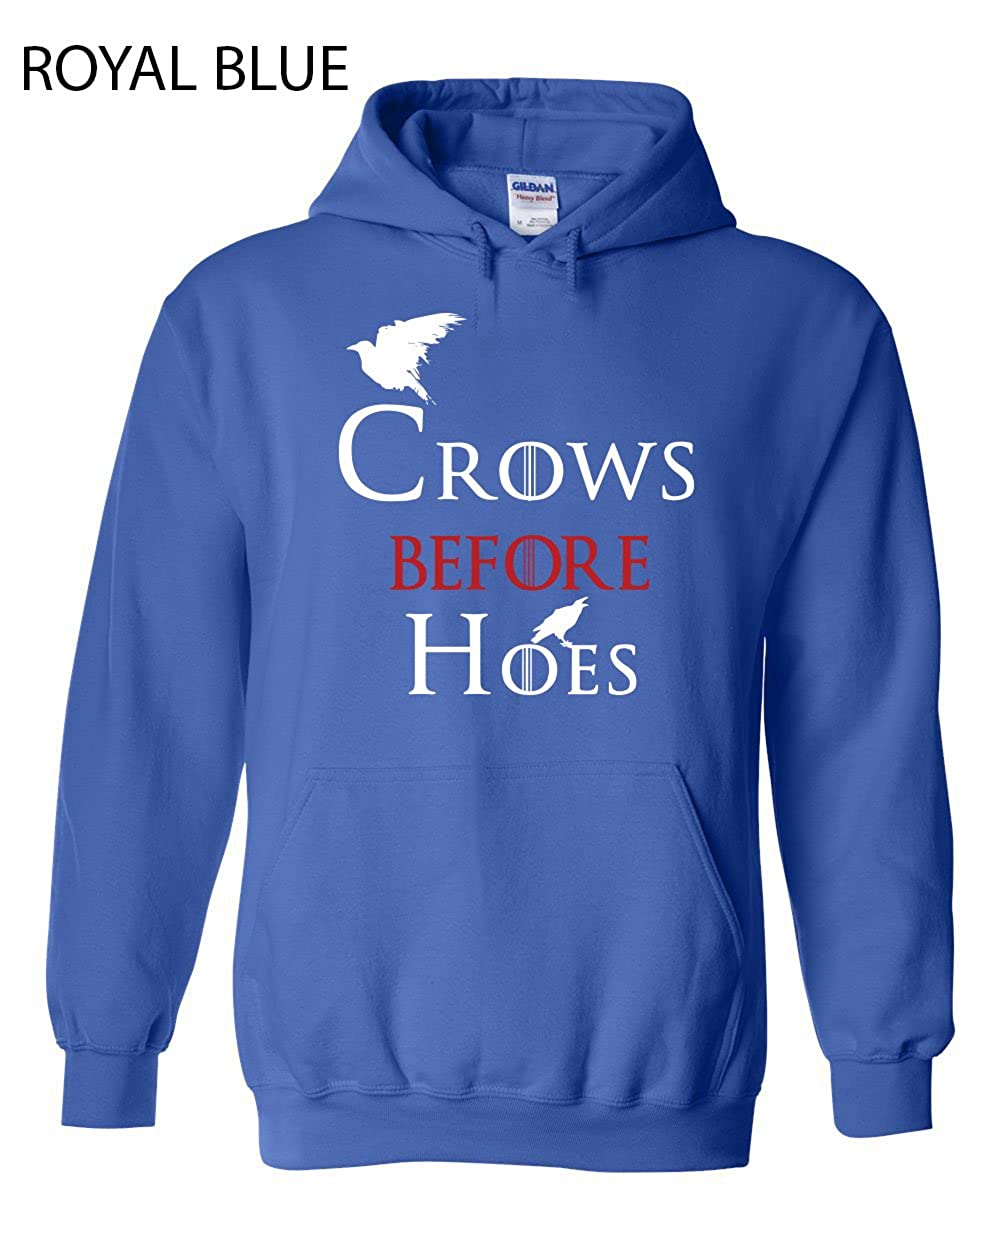 Swaffy Tees 395 Crows Before Hoes Funny Hooded Sweatshirt